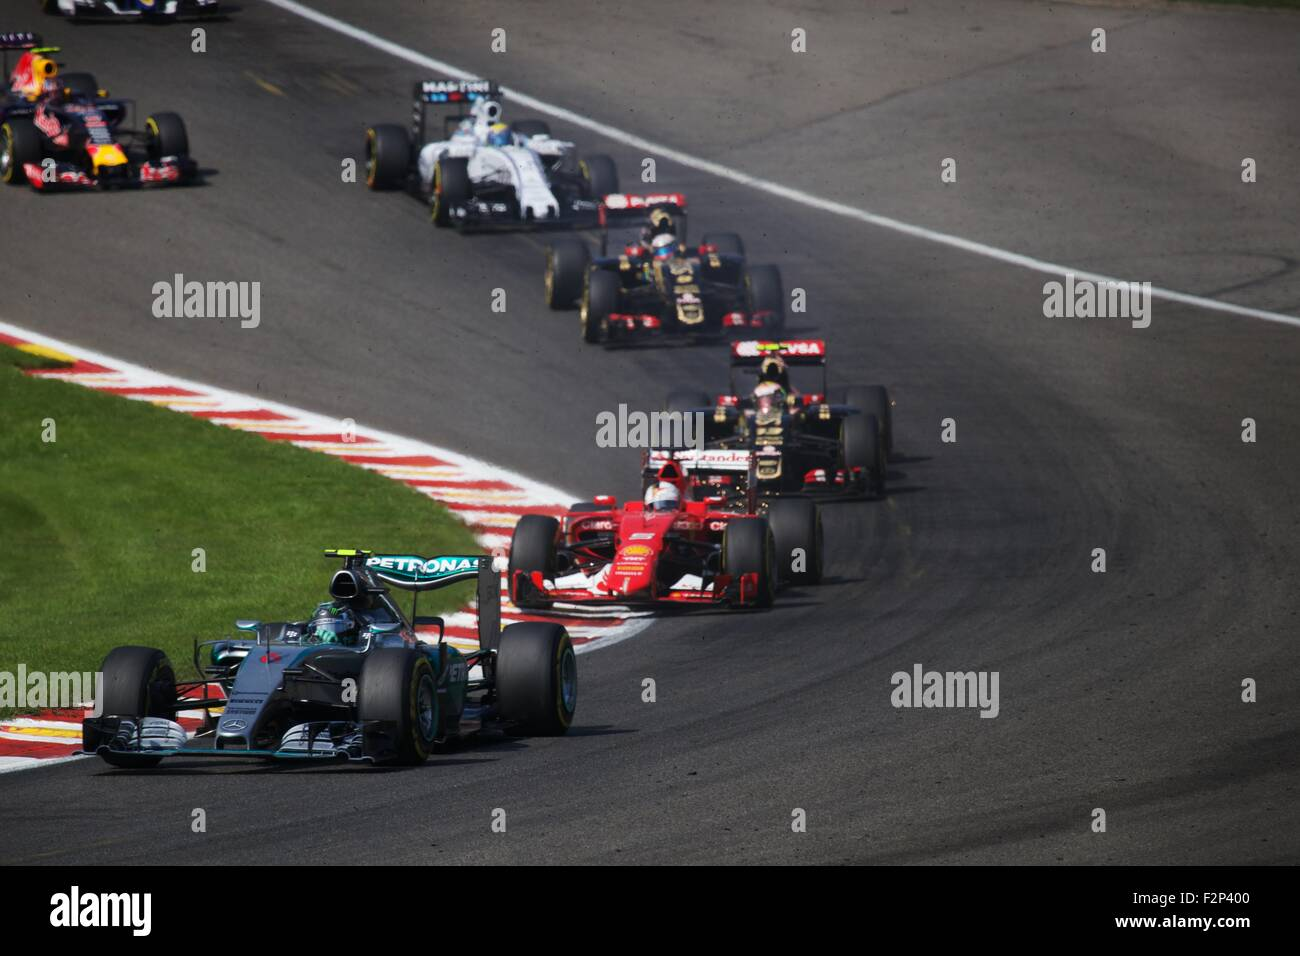 2015 Formula 1 Shell Belgian Grand Prix, Spa. - Stock Image